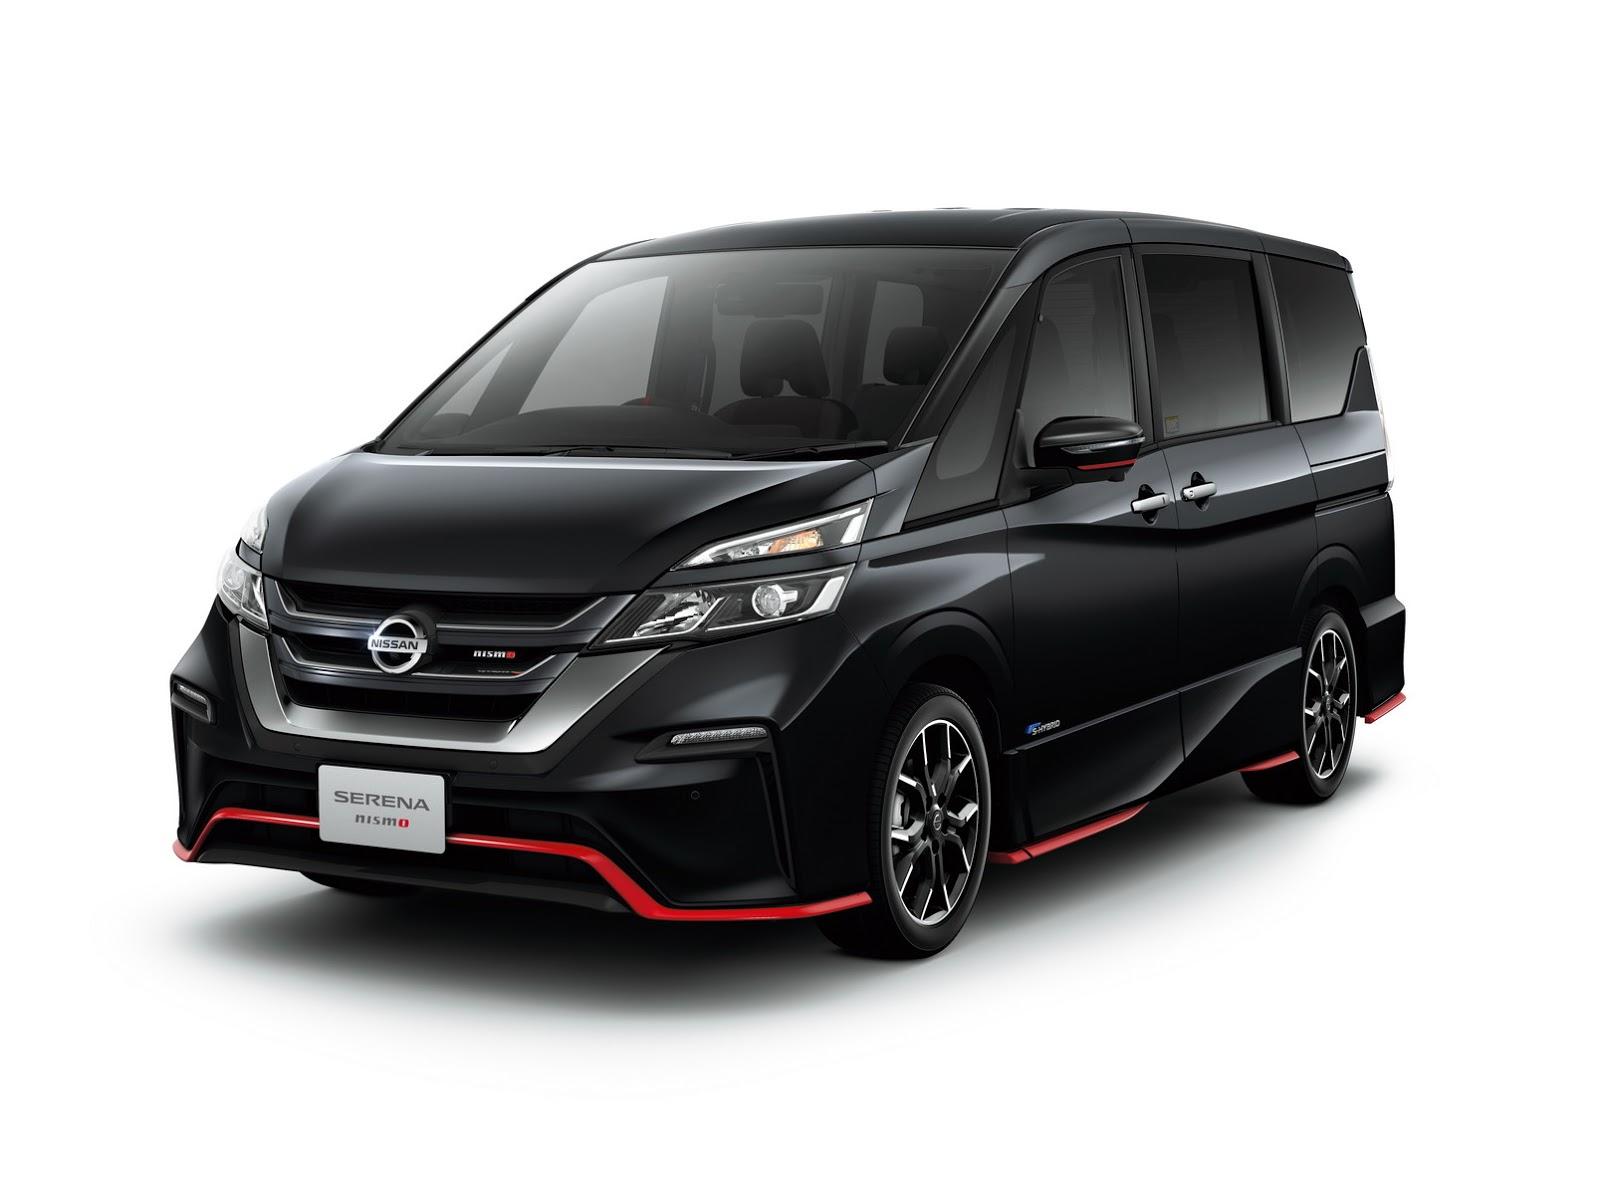 Nissan_Serena_Nismo_20